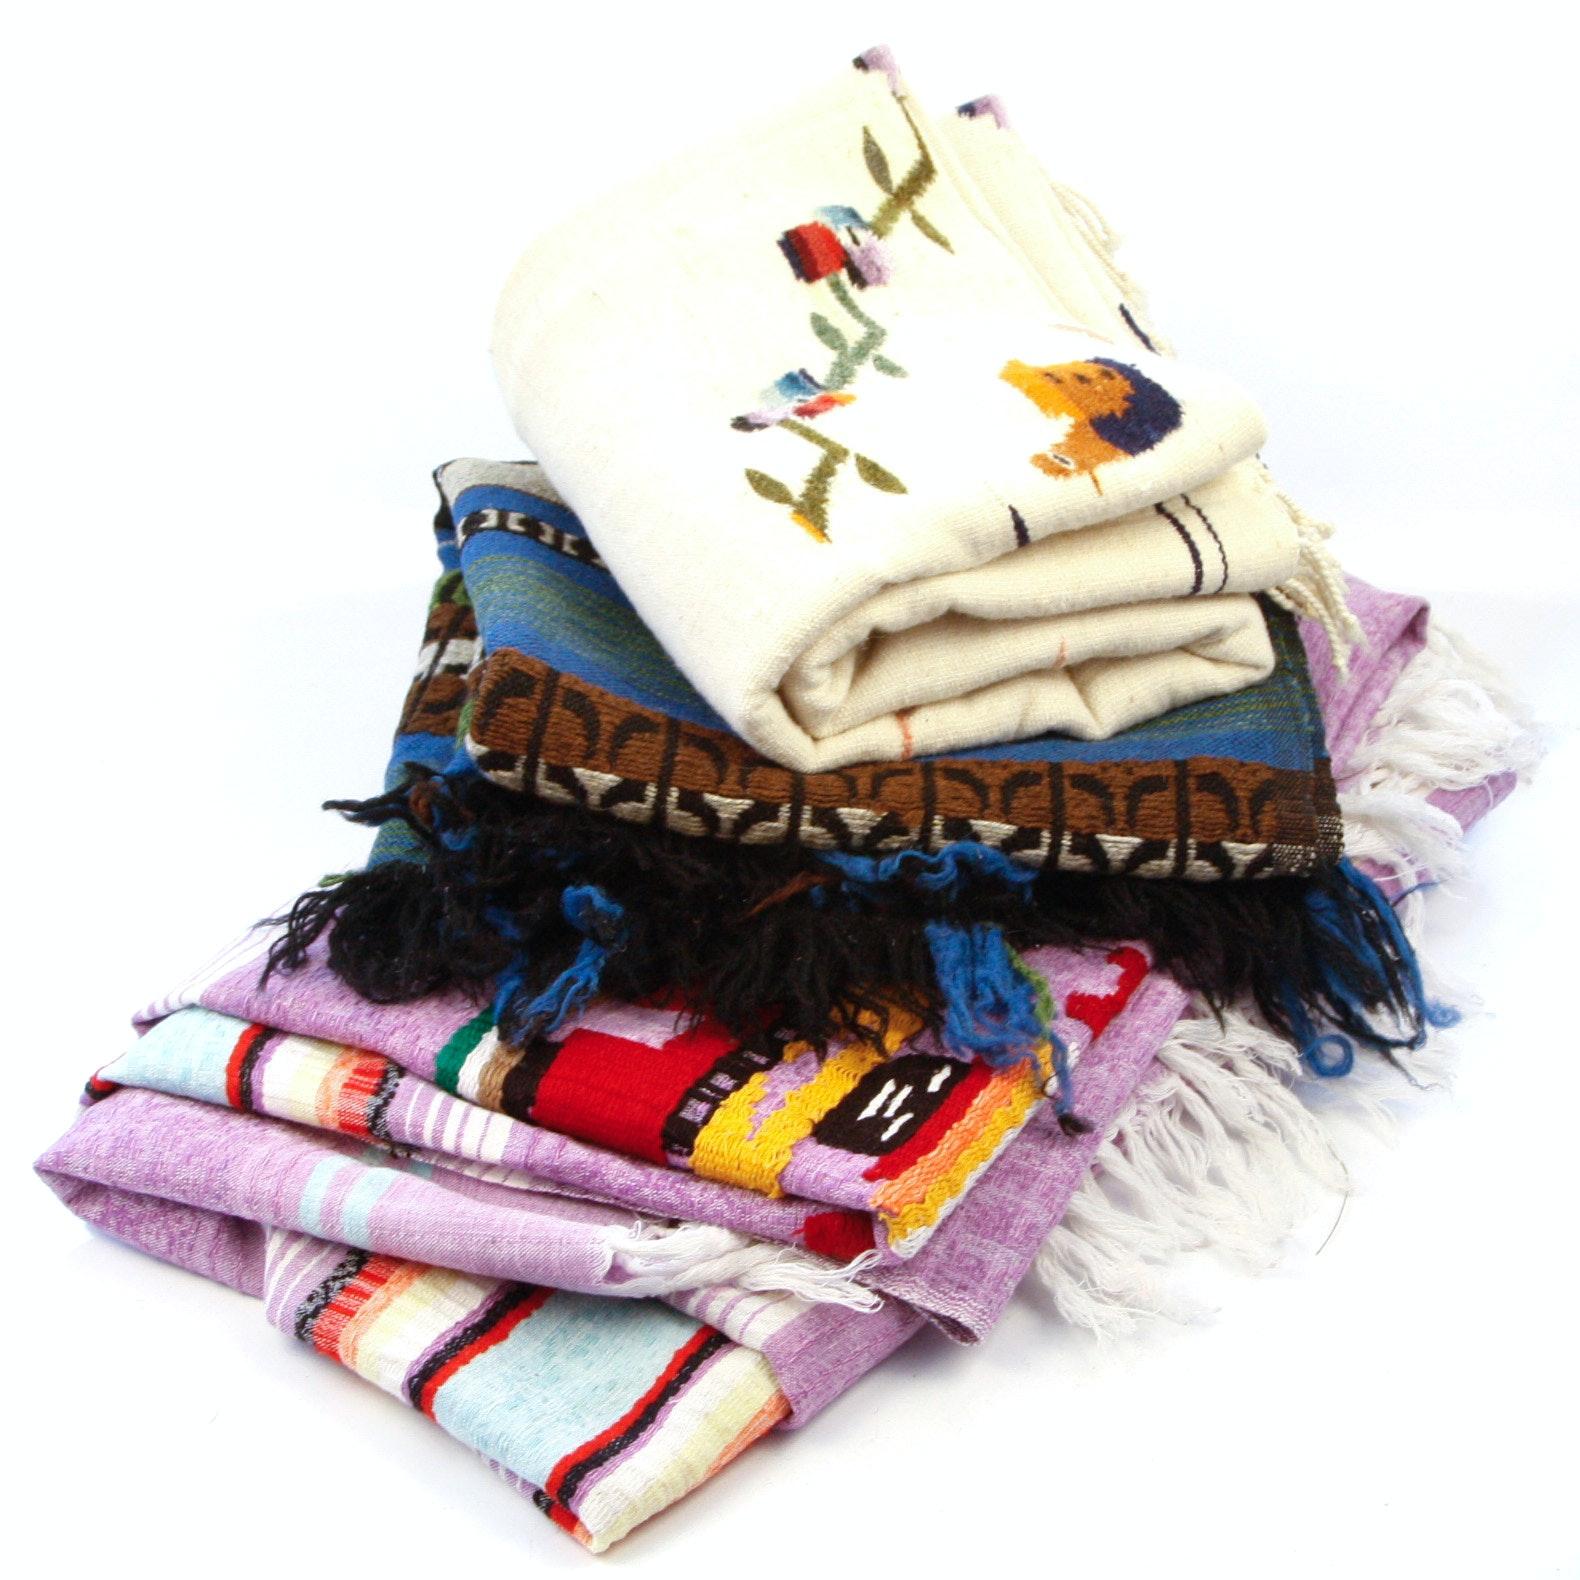 Handmade Wool and Linen Textiles